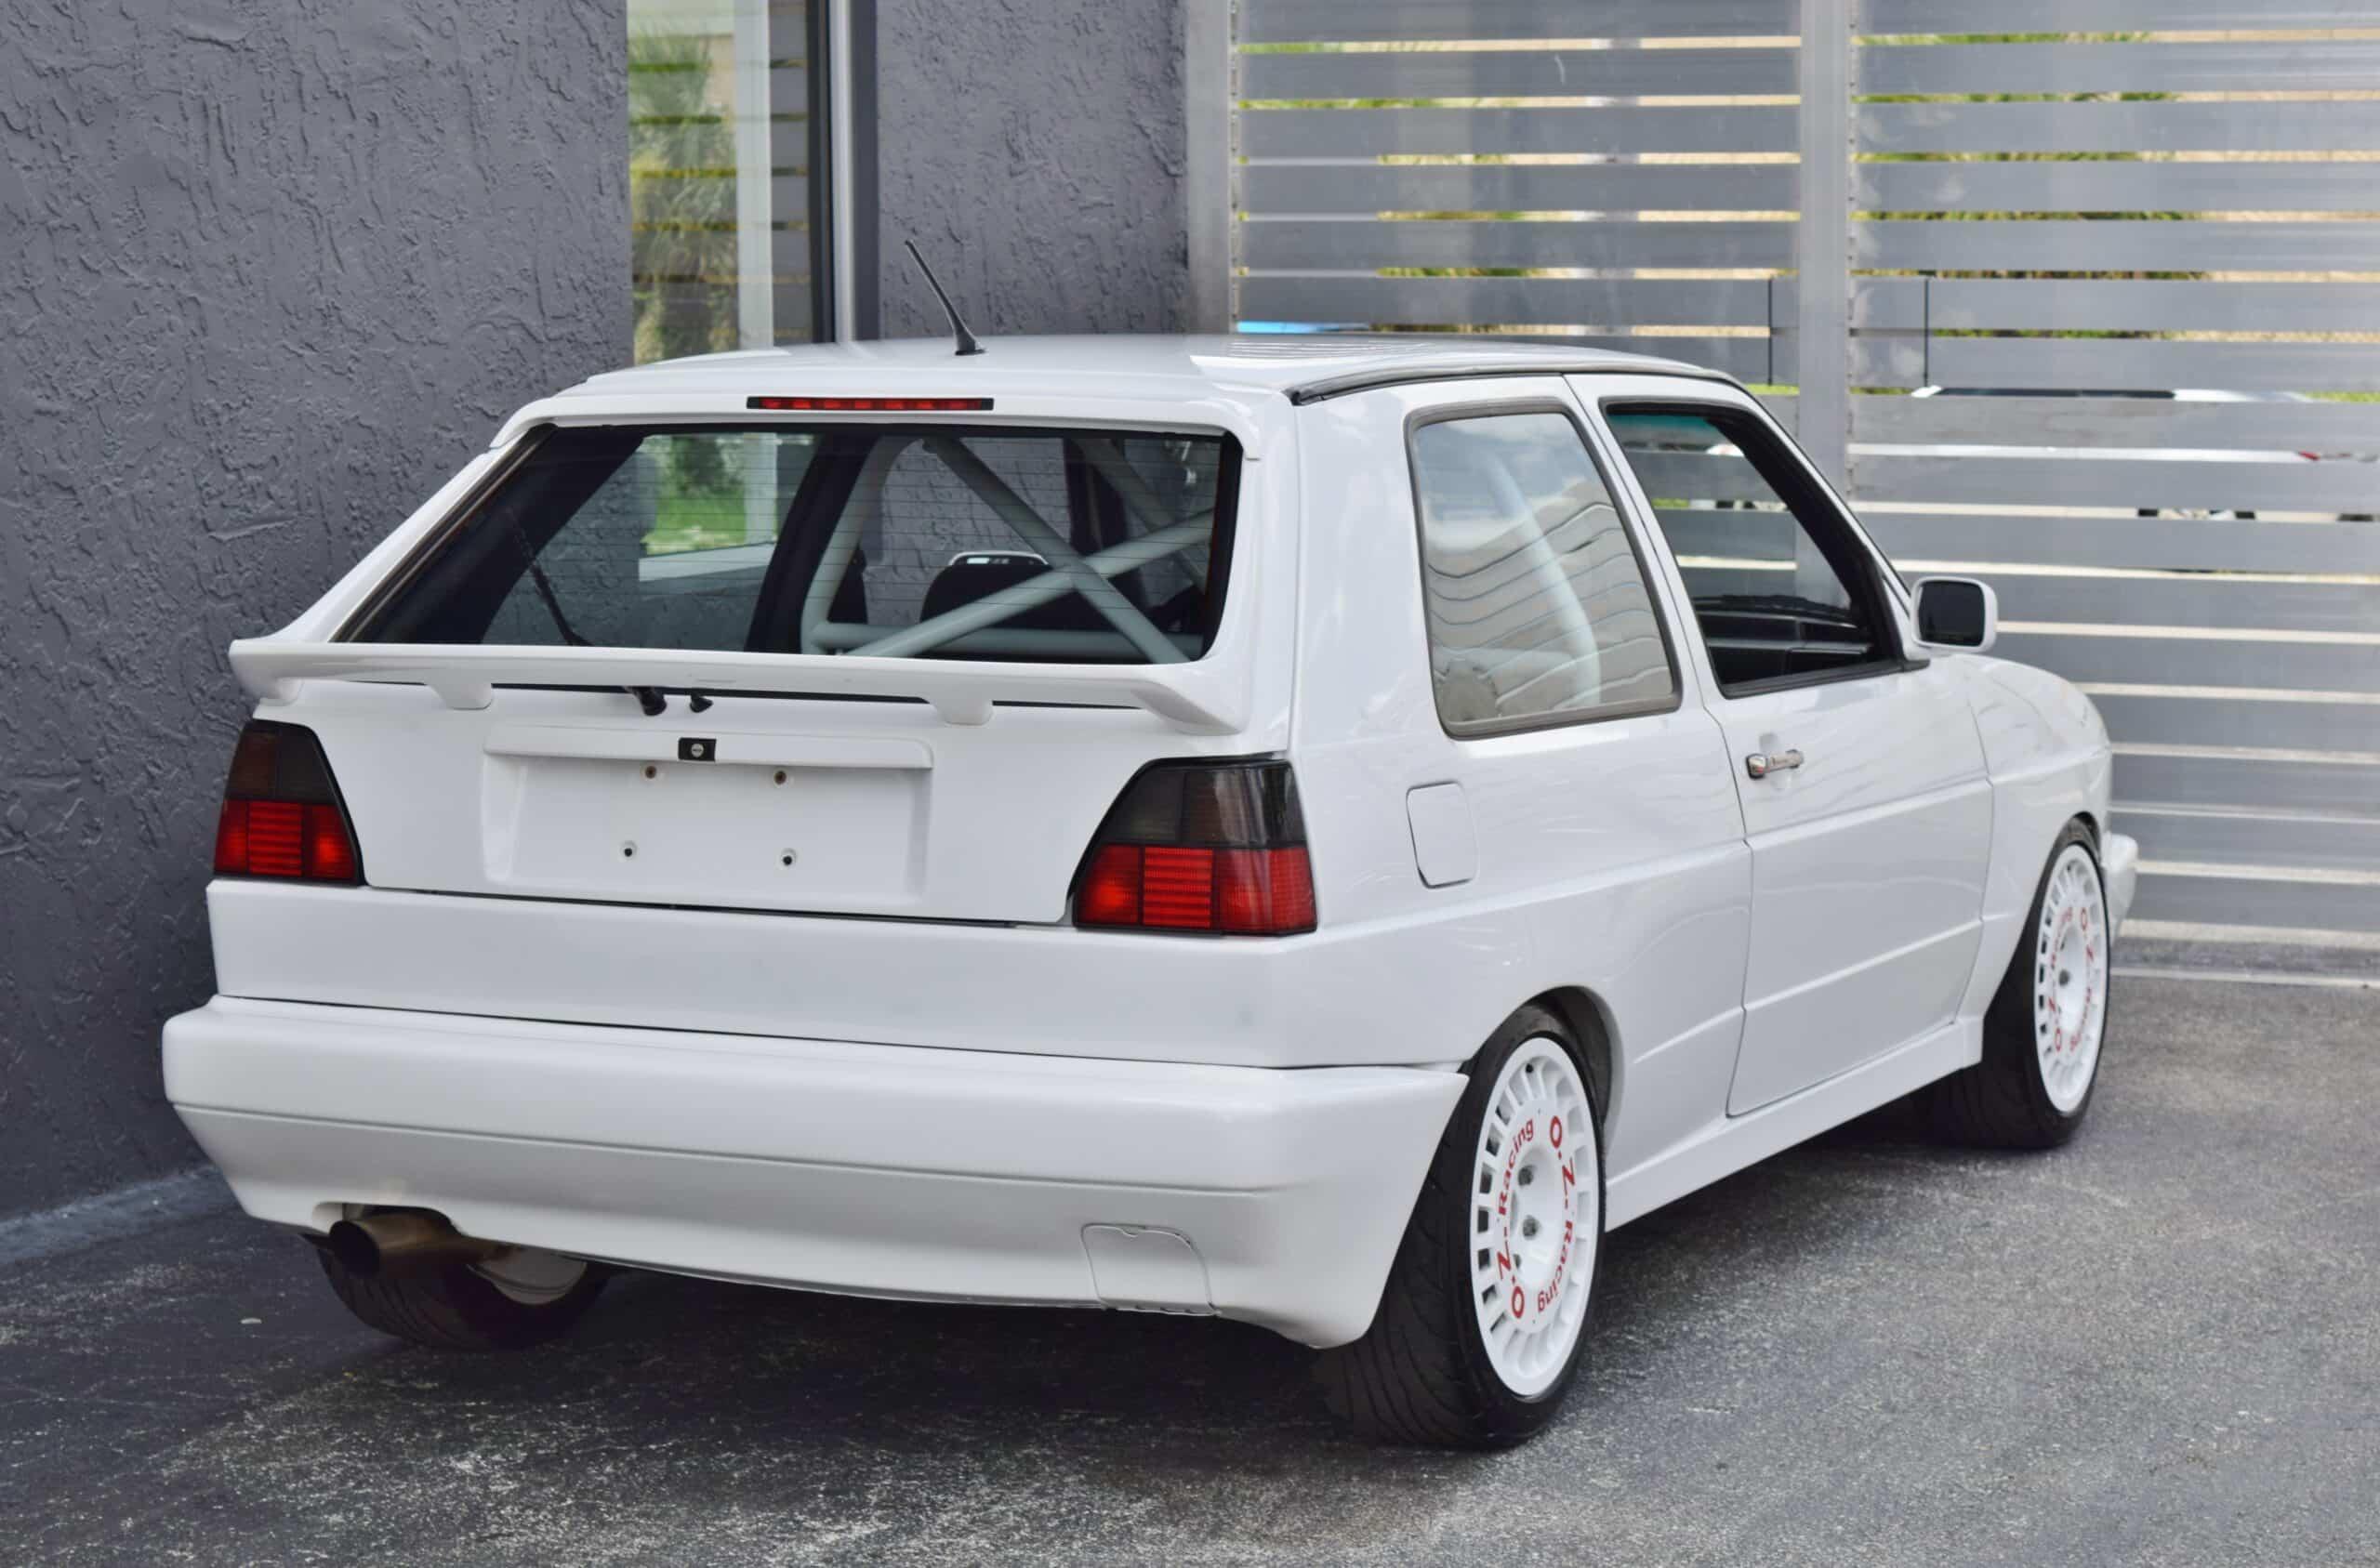 1990 Volkswagen Golf MK 2 Rallye Tribute Metal Widebody-VR6-Recaro Seats-OZ Racing Wheels-Cage-CAE Shifter